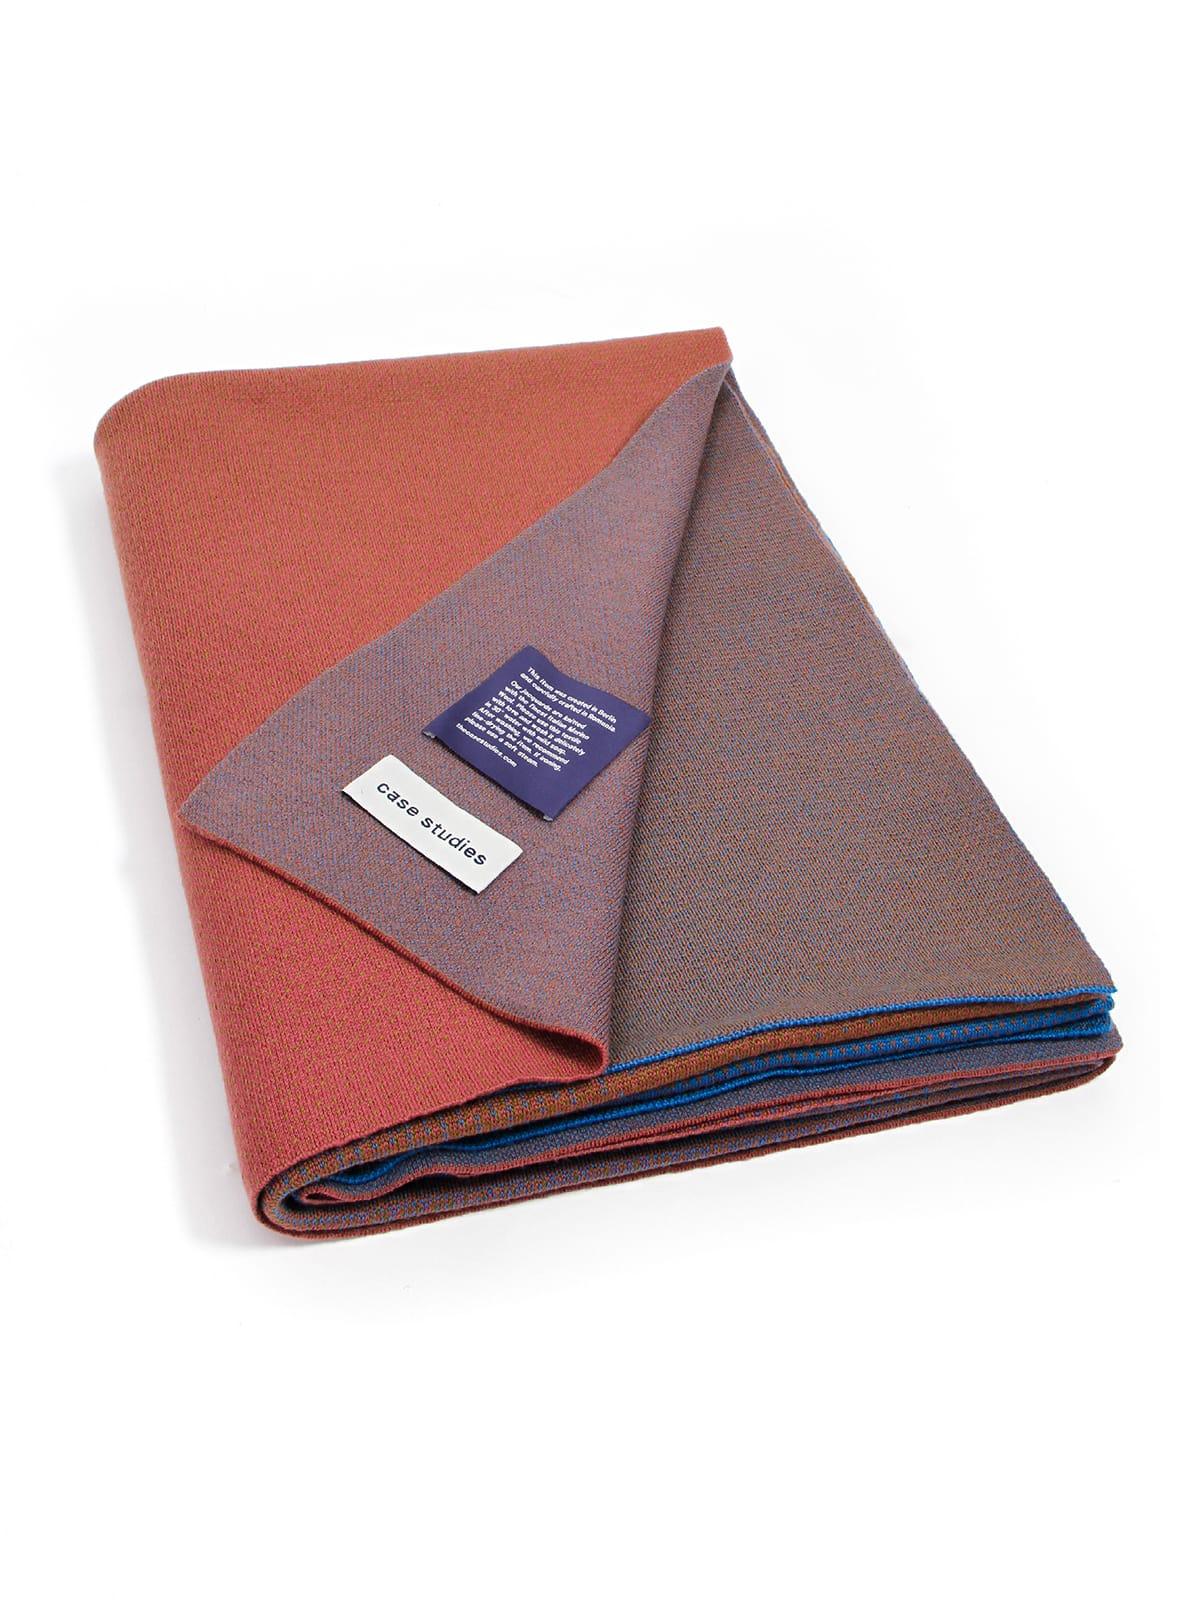 Knitted Blanket Lucca - Merino Wool folded